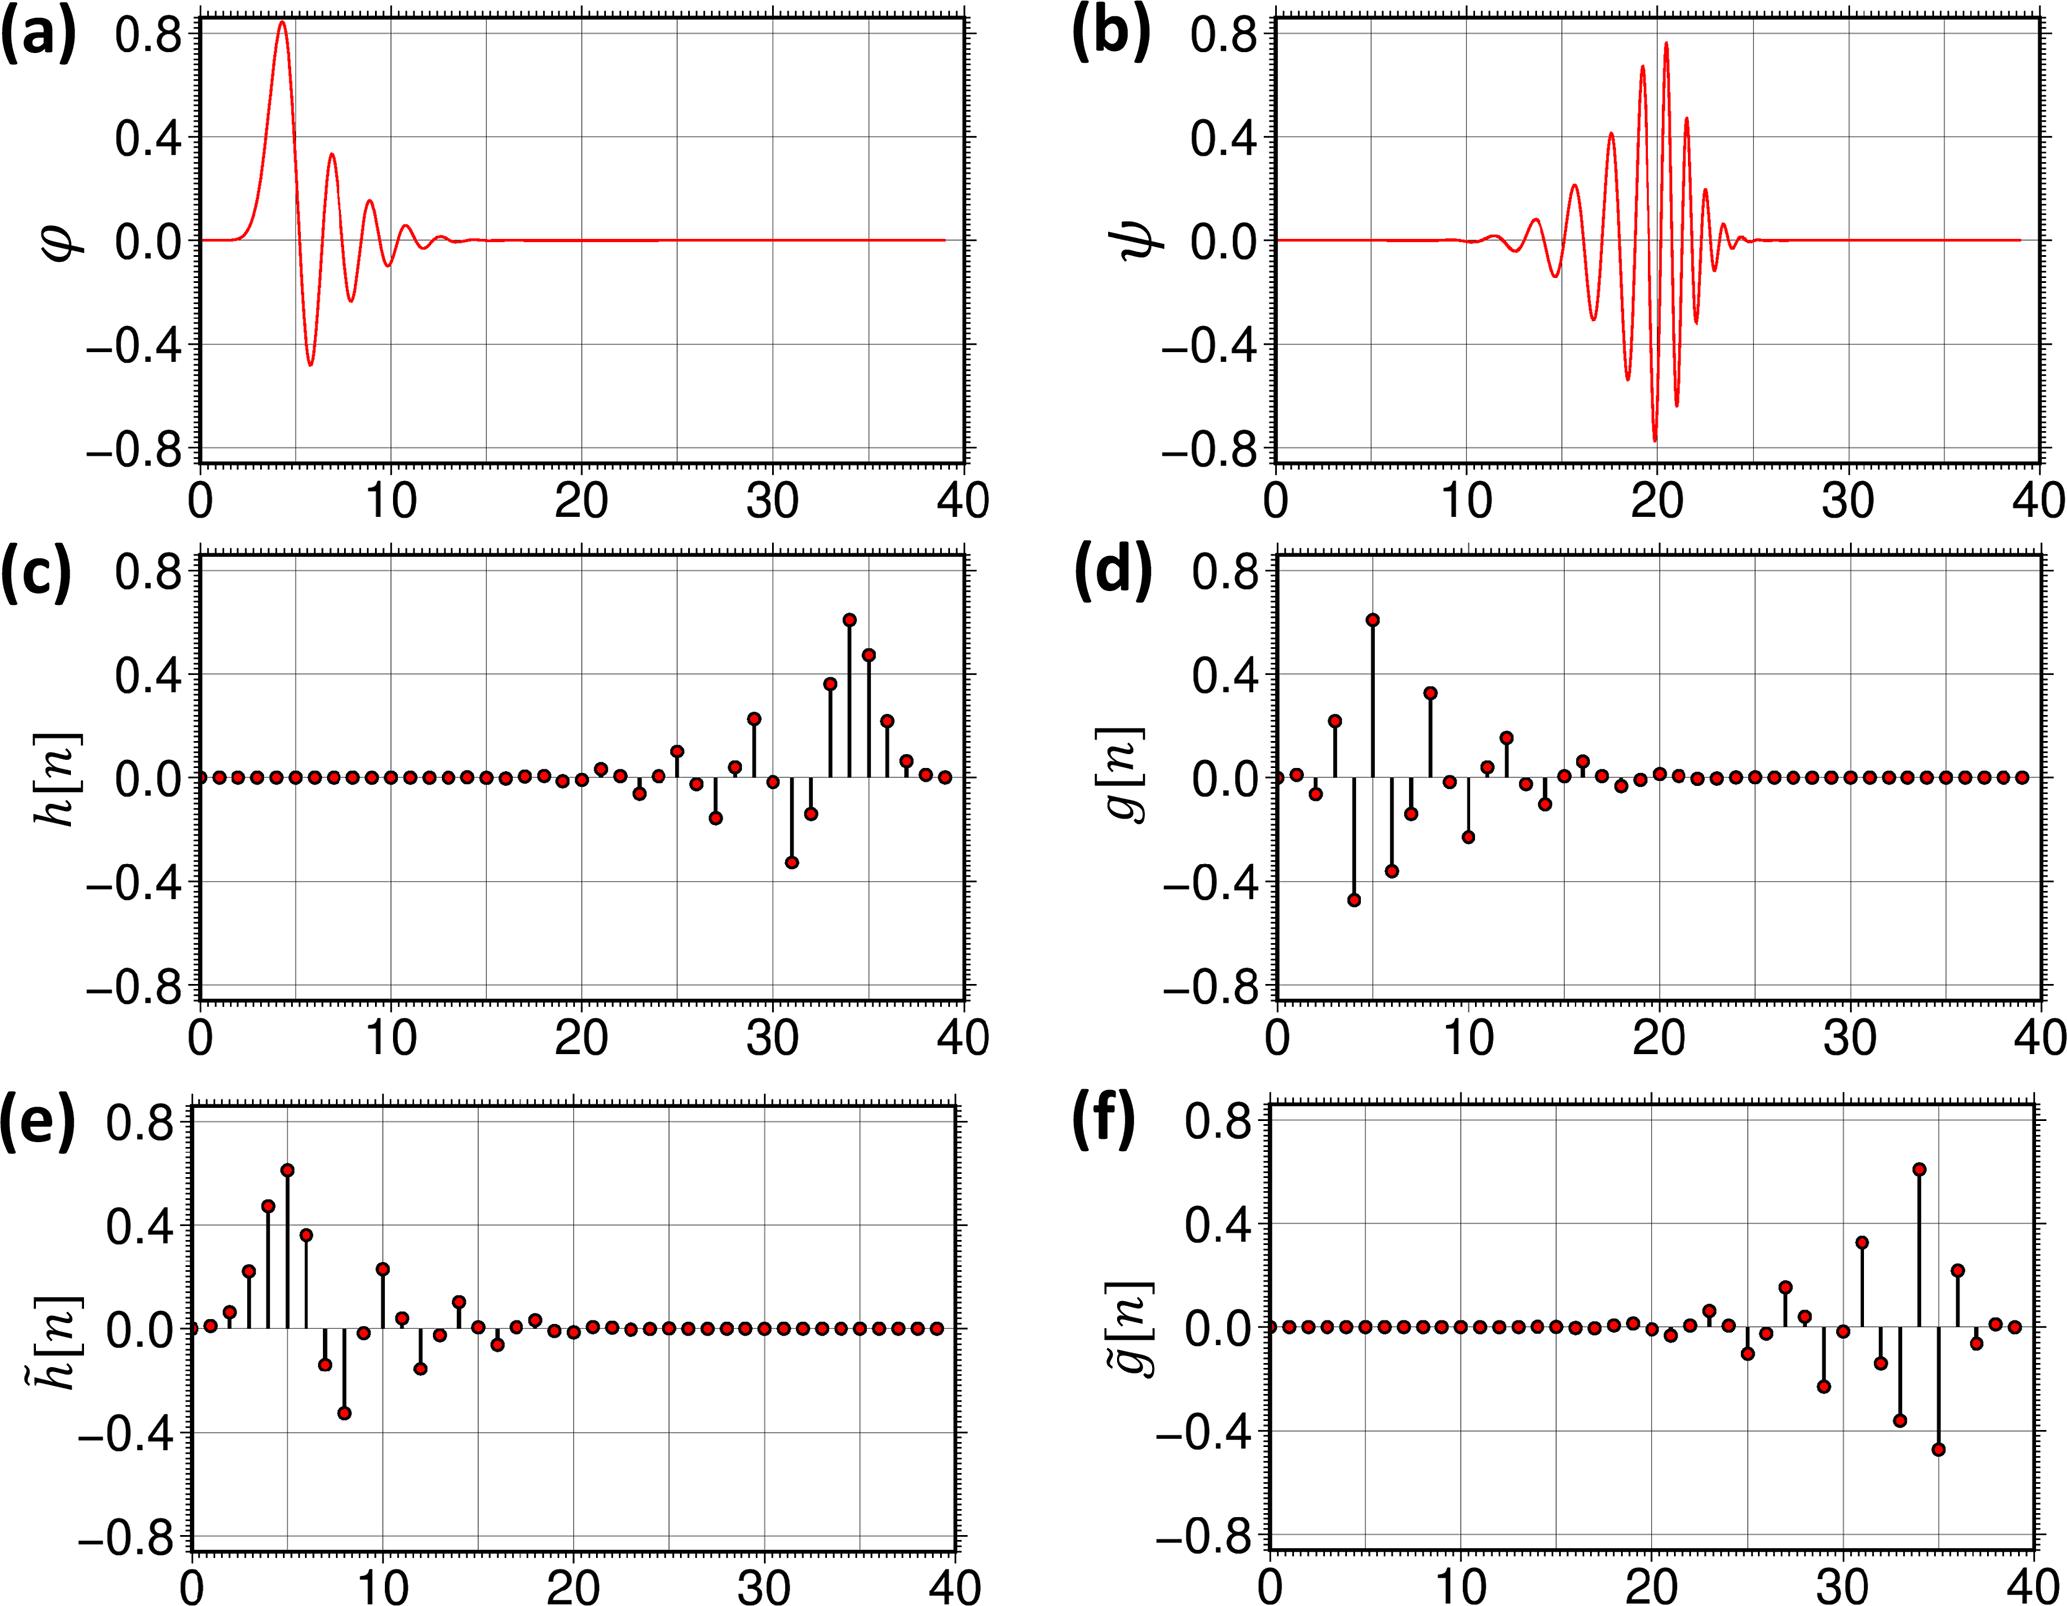 GI - Multiresolution wavelet analysis applied to GRACE range